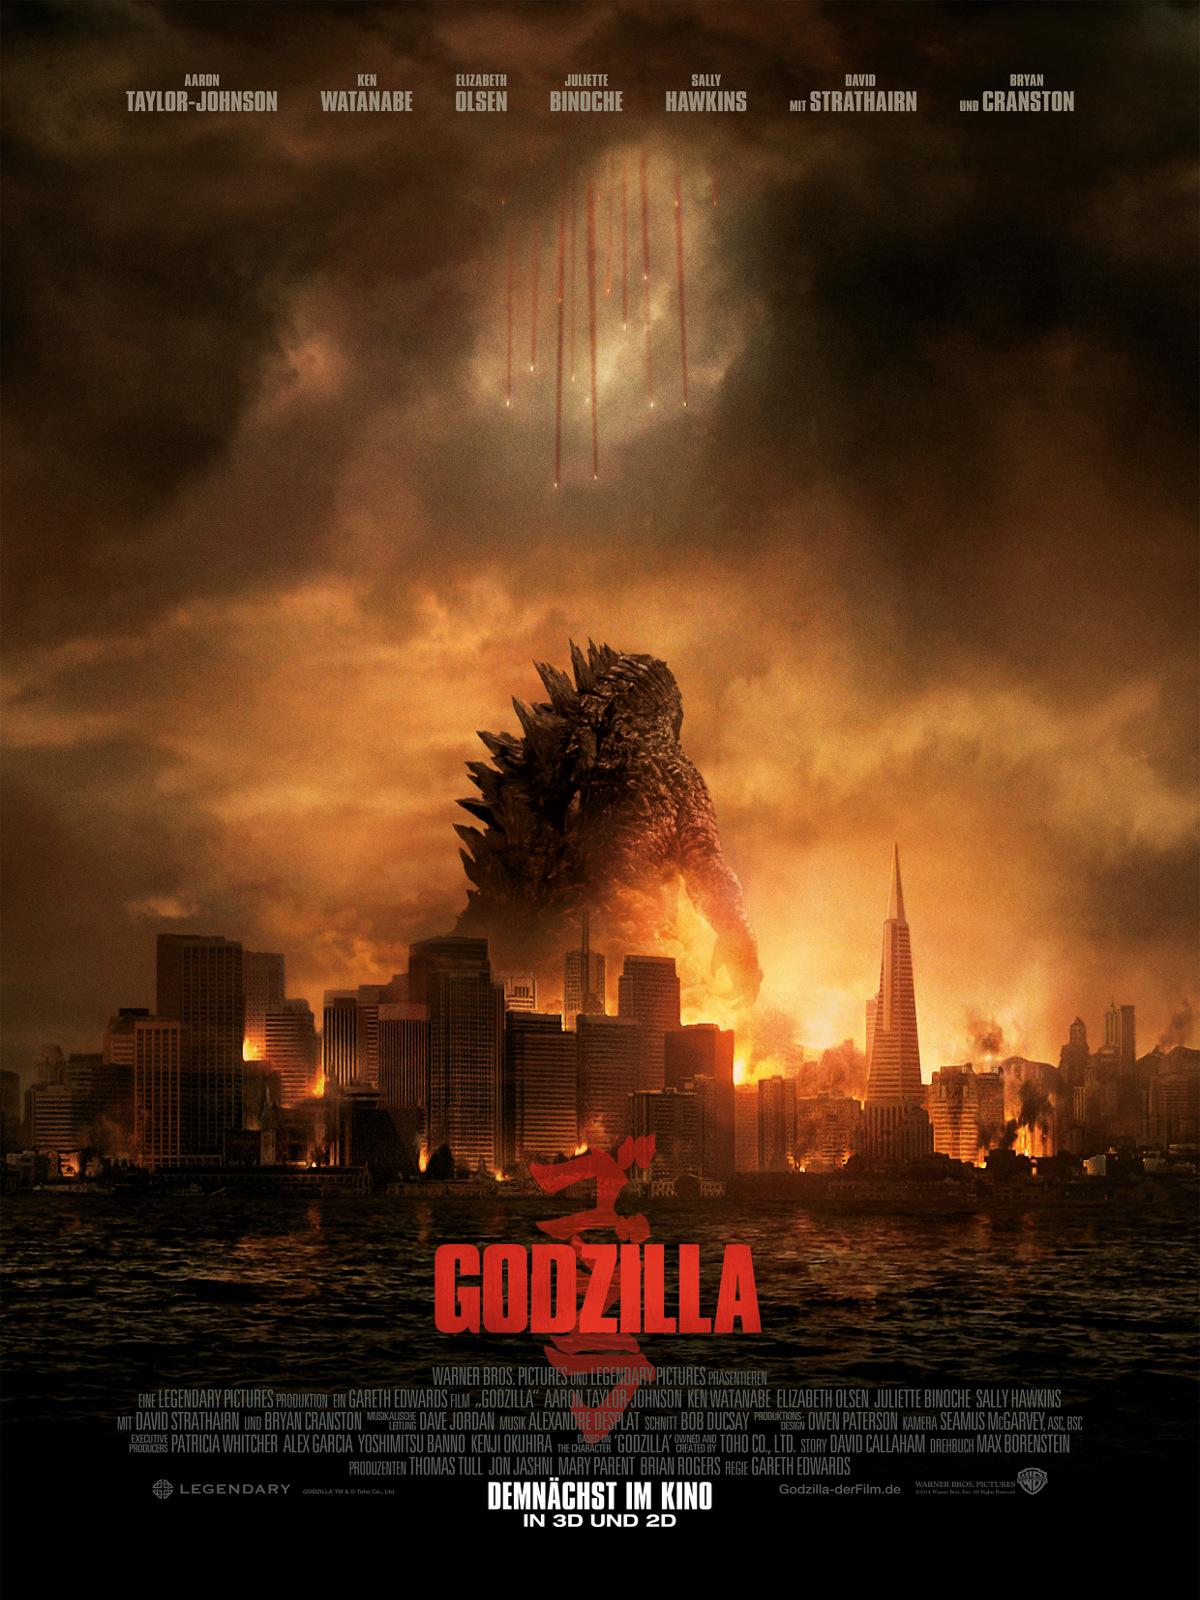 Godzilla - Film 2014 - FILMSTARTS.de  Godzilla - Film...